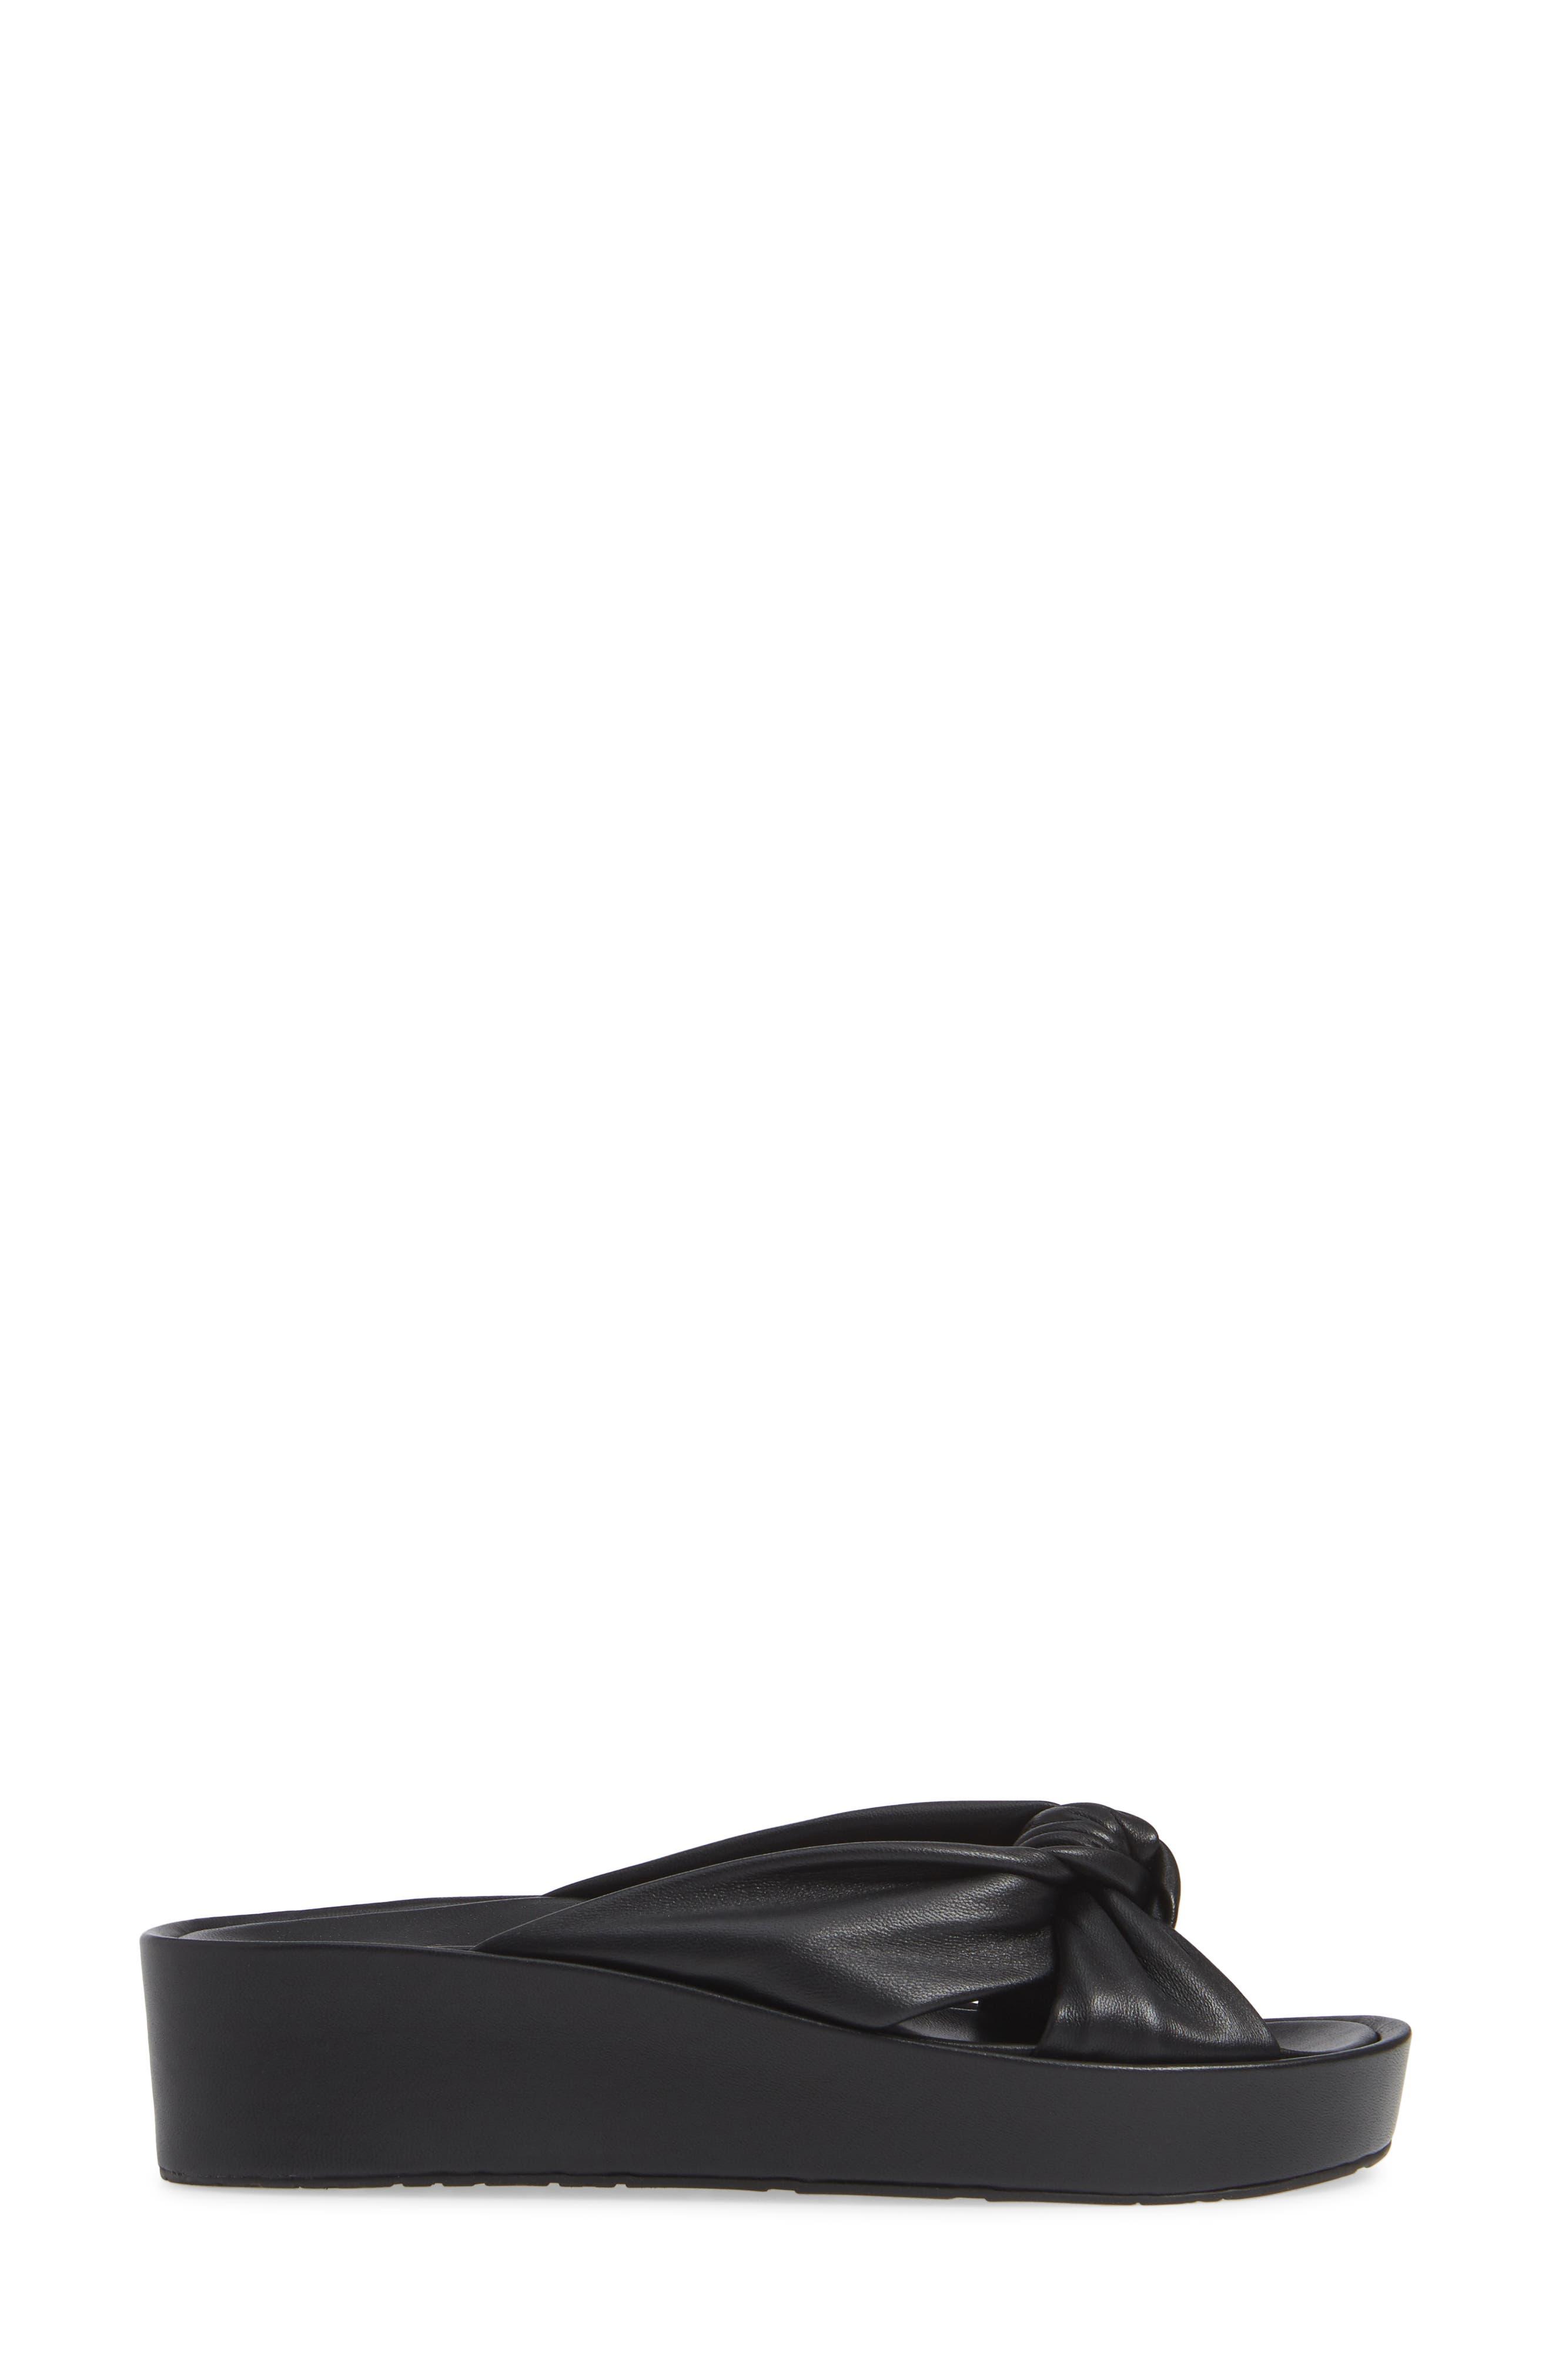 Lany Platform Slide Sandal,                             Alternate thumbnail 3, color,                             BLACK LEATHER